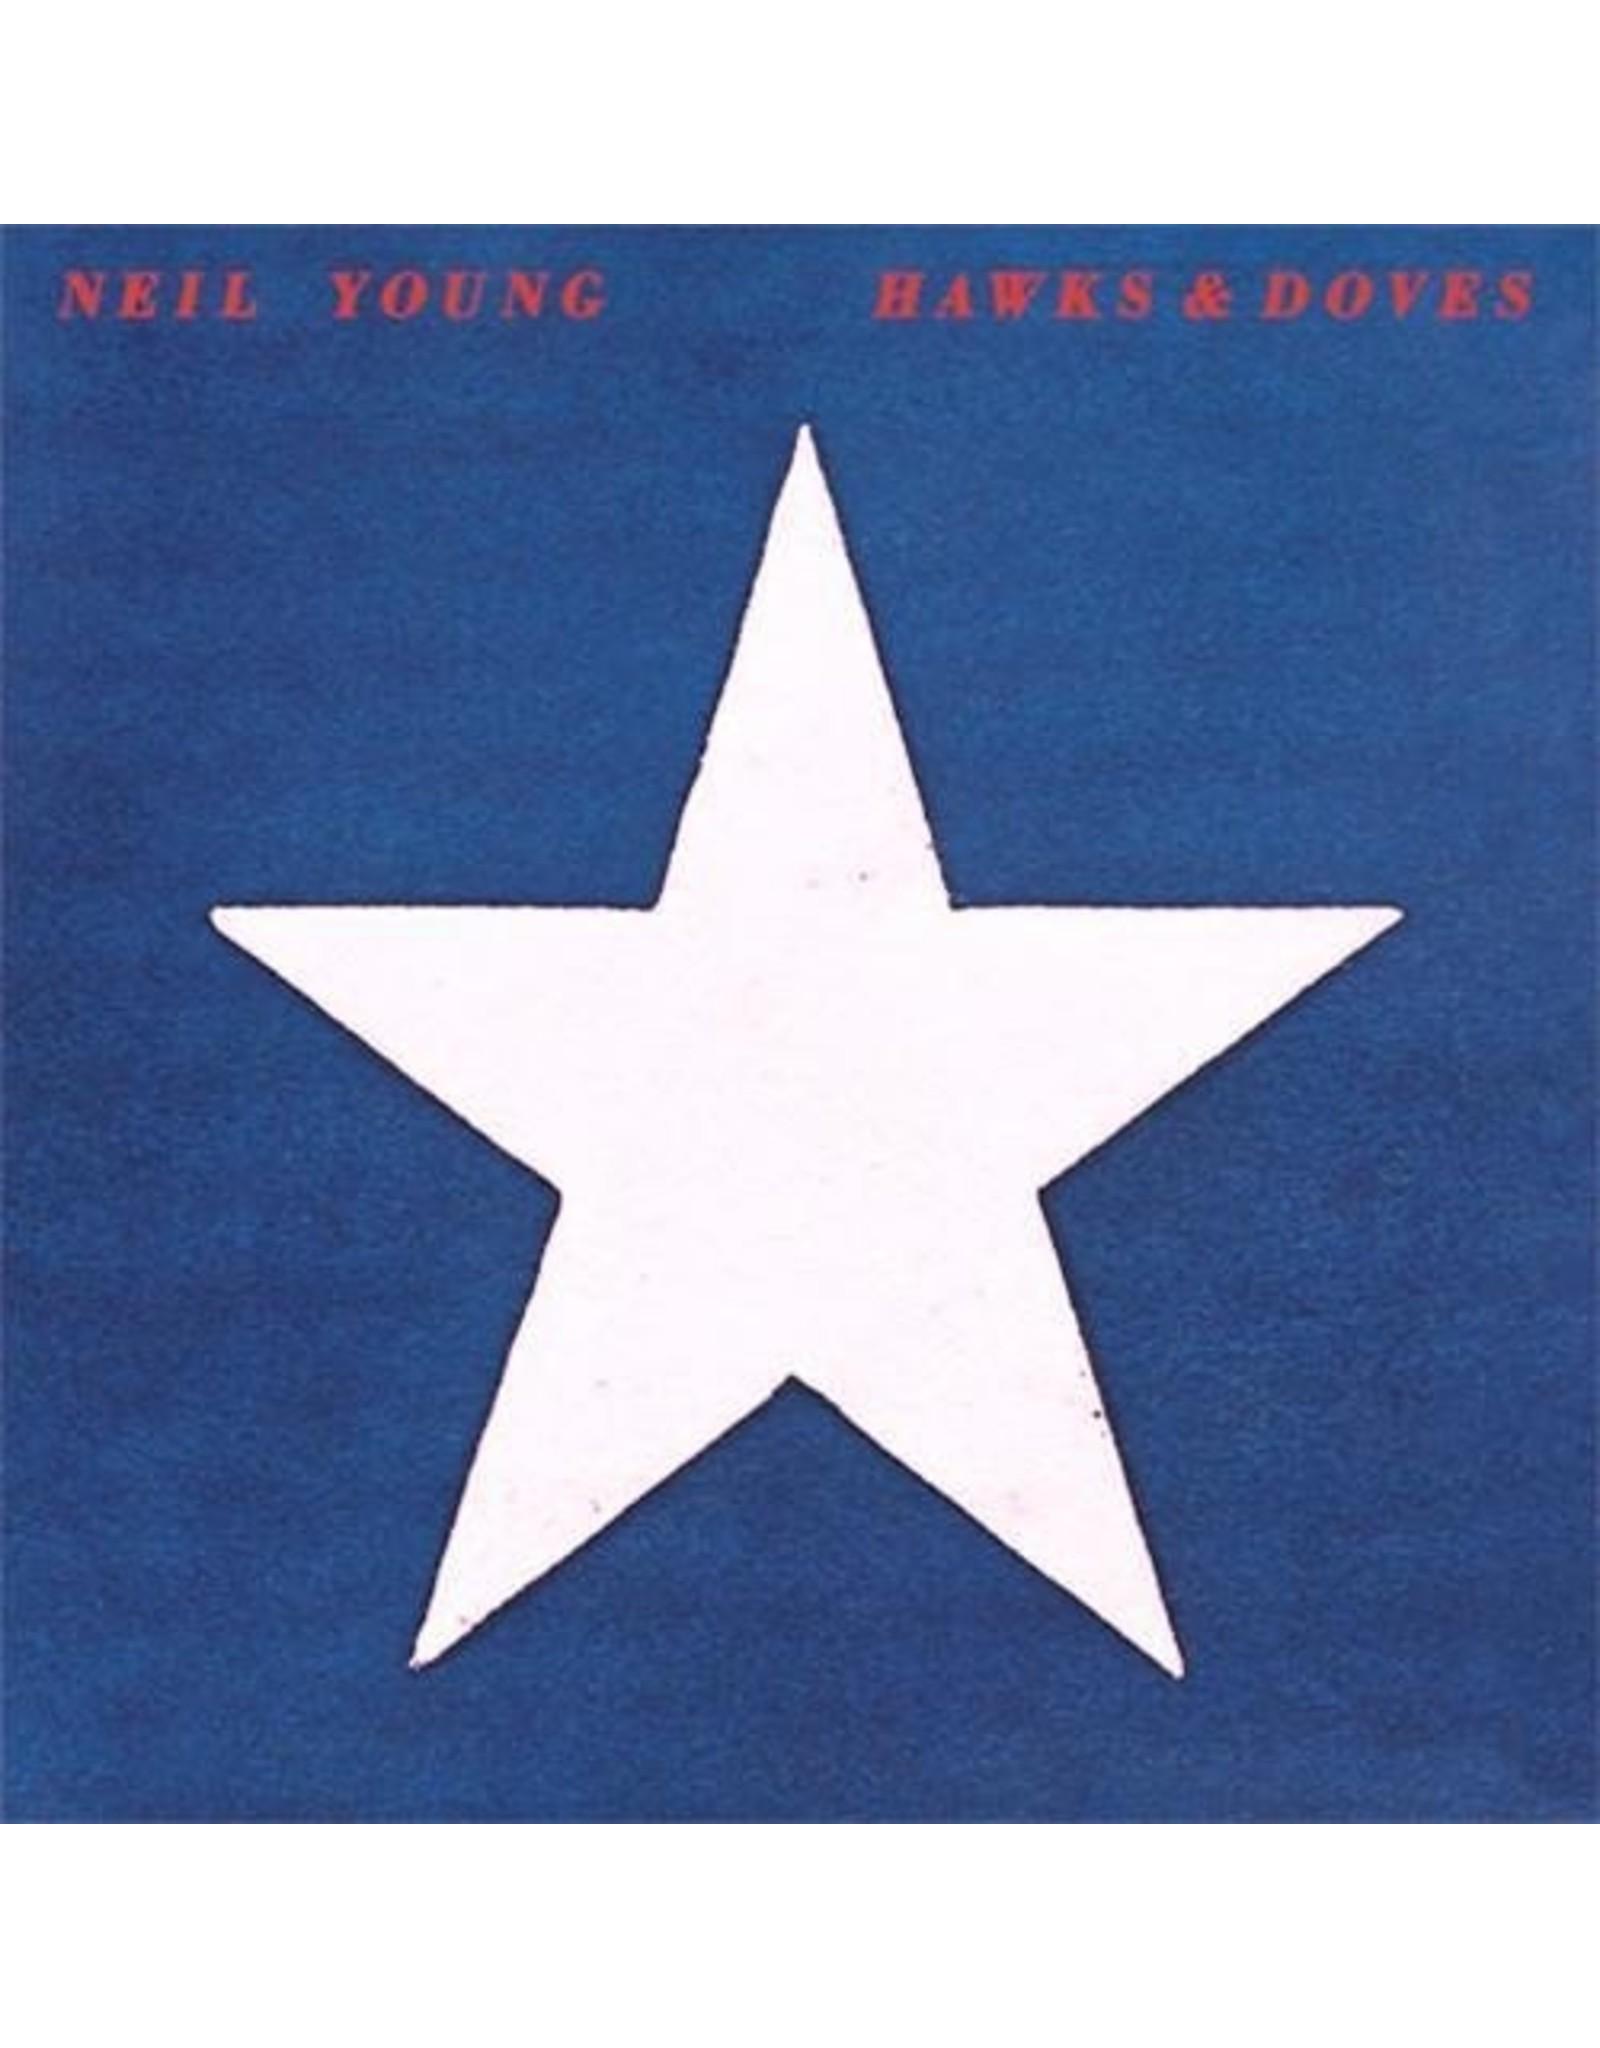 New Vinyl Neil Young - Hawks & Doves LP